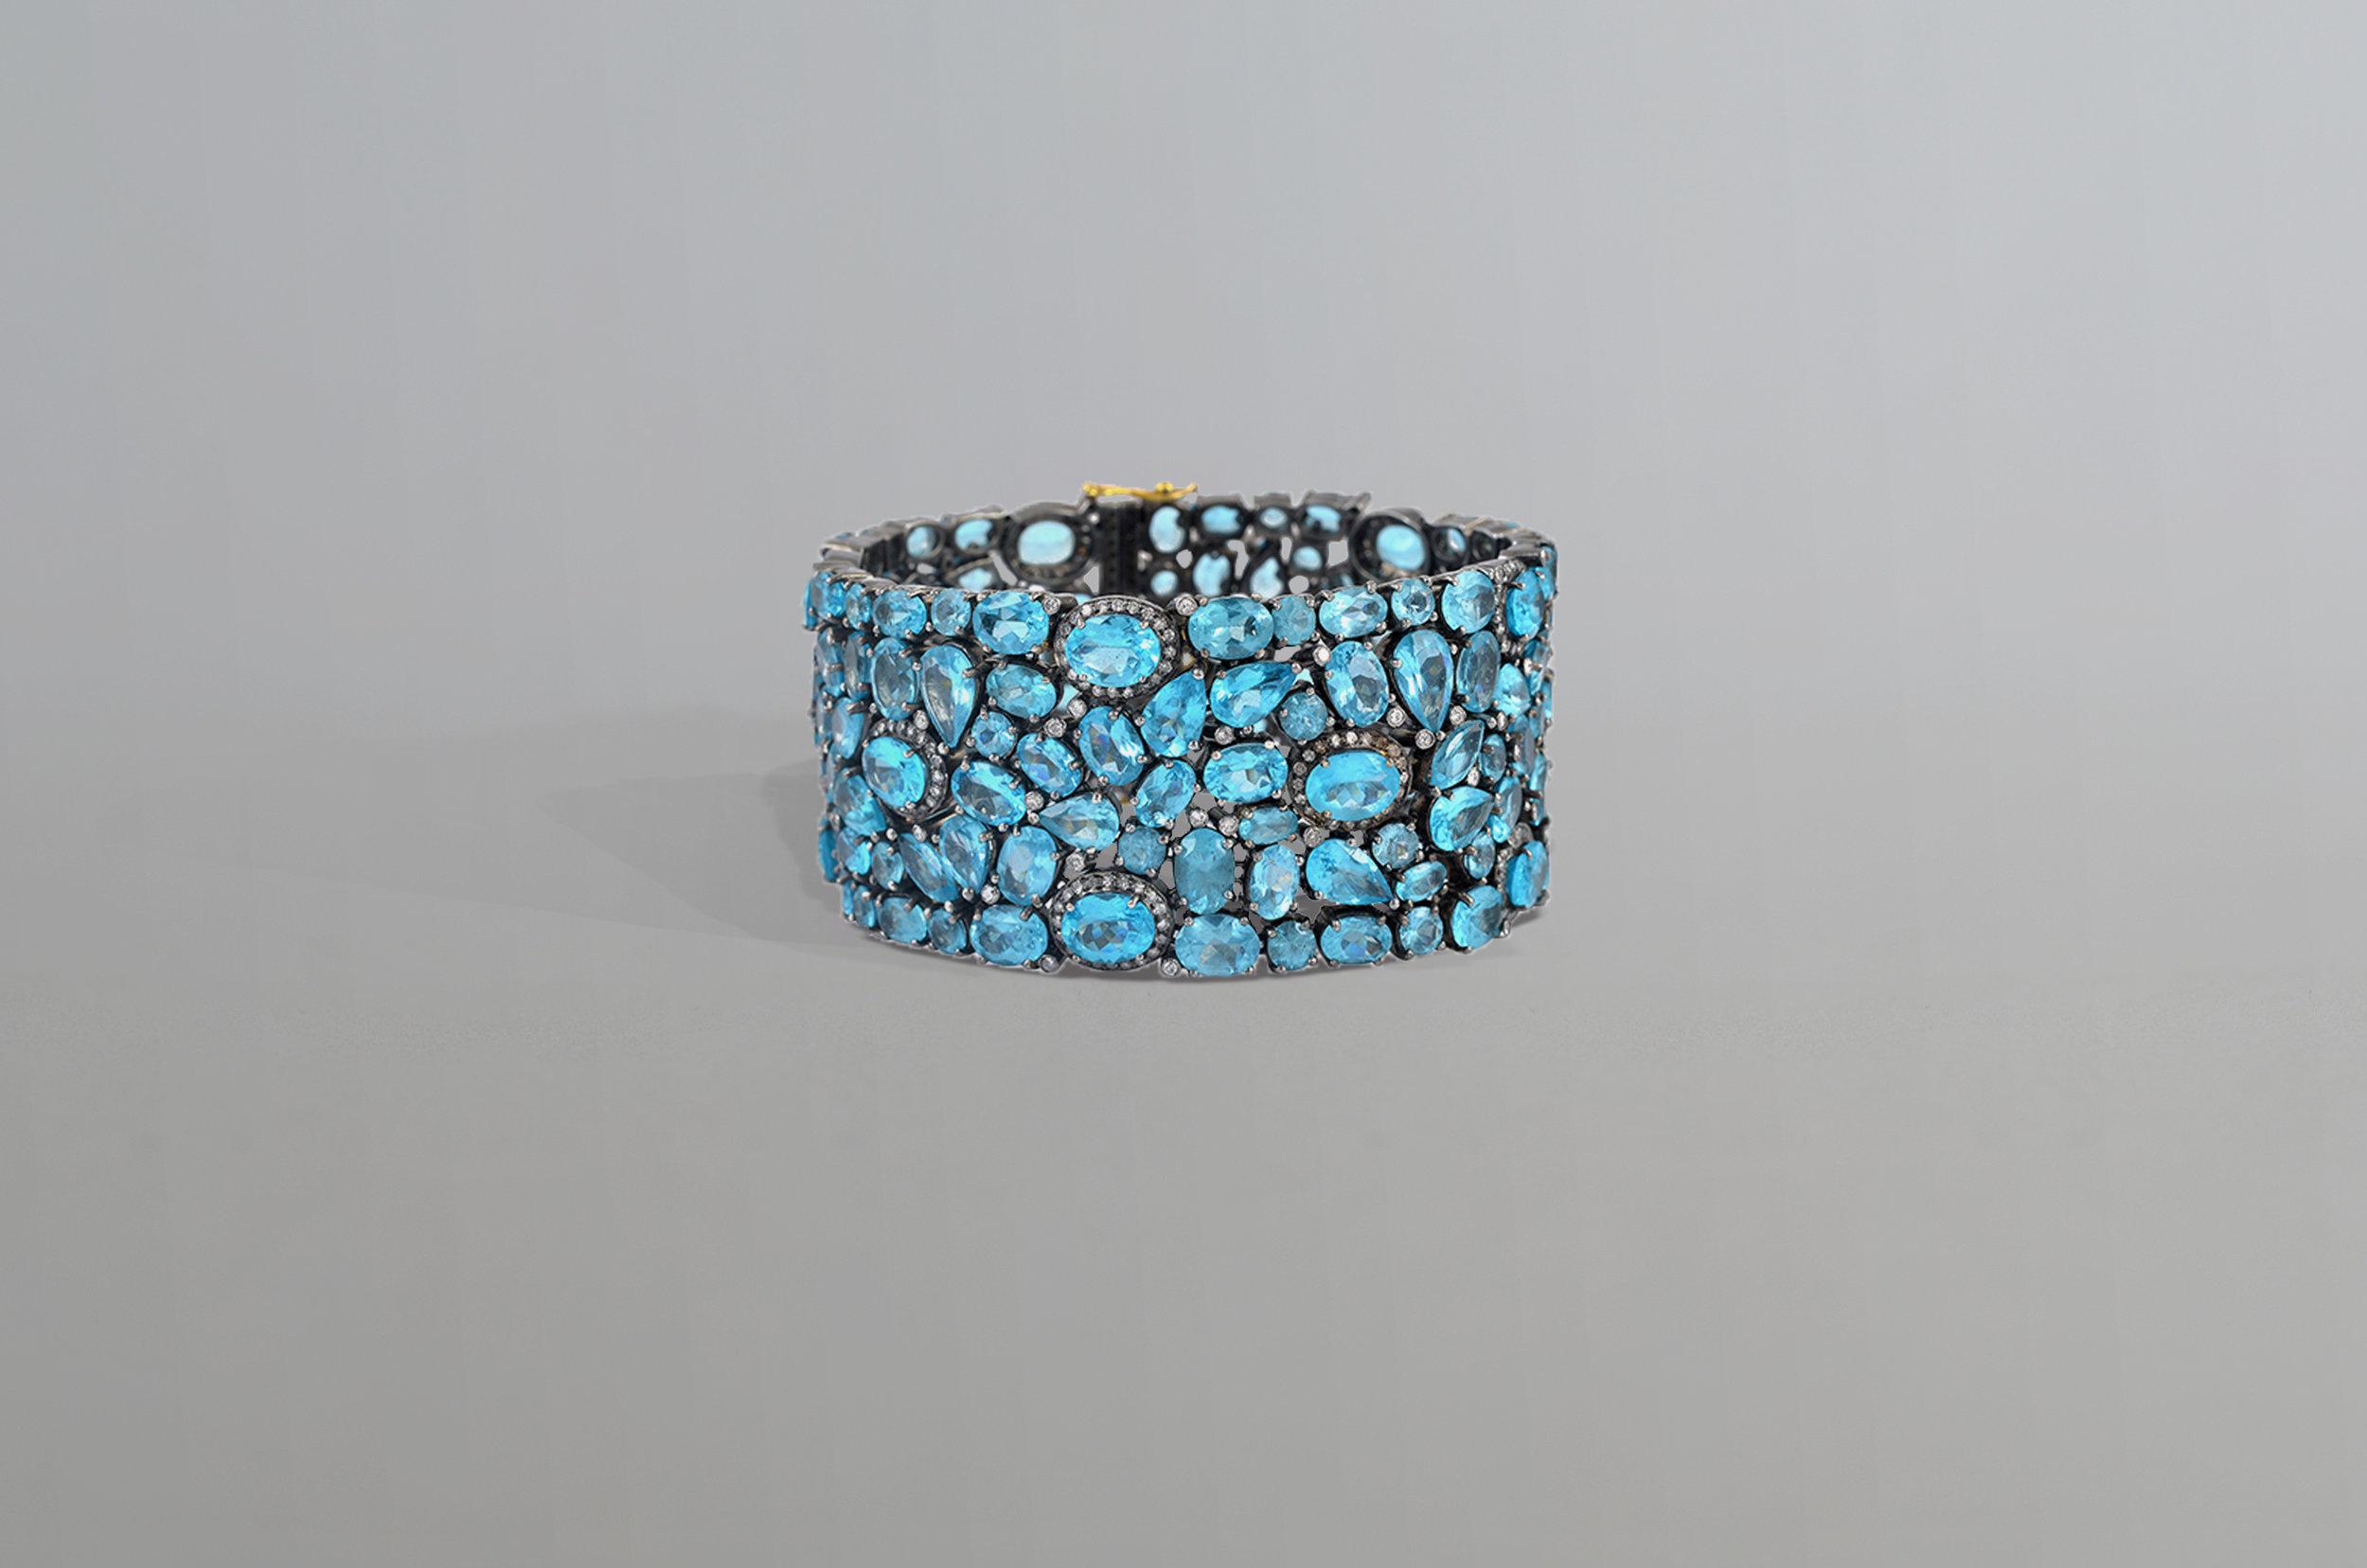 95.10 Carat Apatite with 2.95 Carat Diamond Bracelet set in Sterling Silver